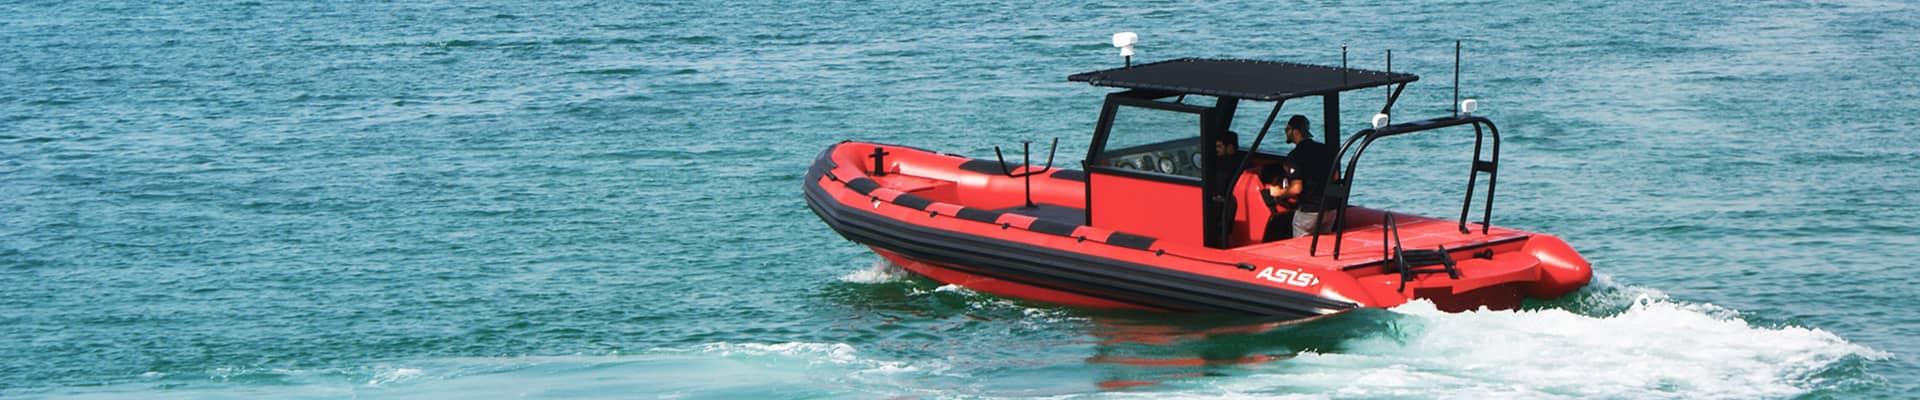 diving-rigid-inflatable-boat-RIB